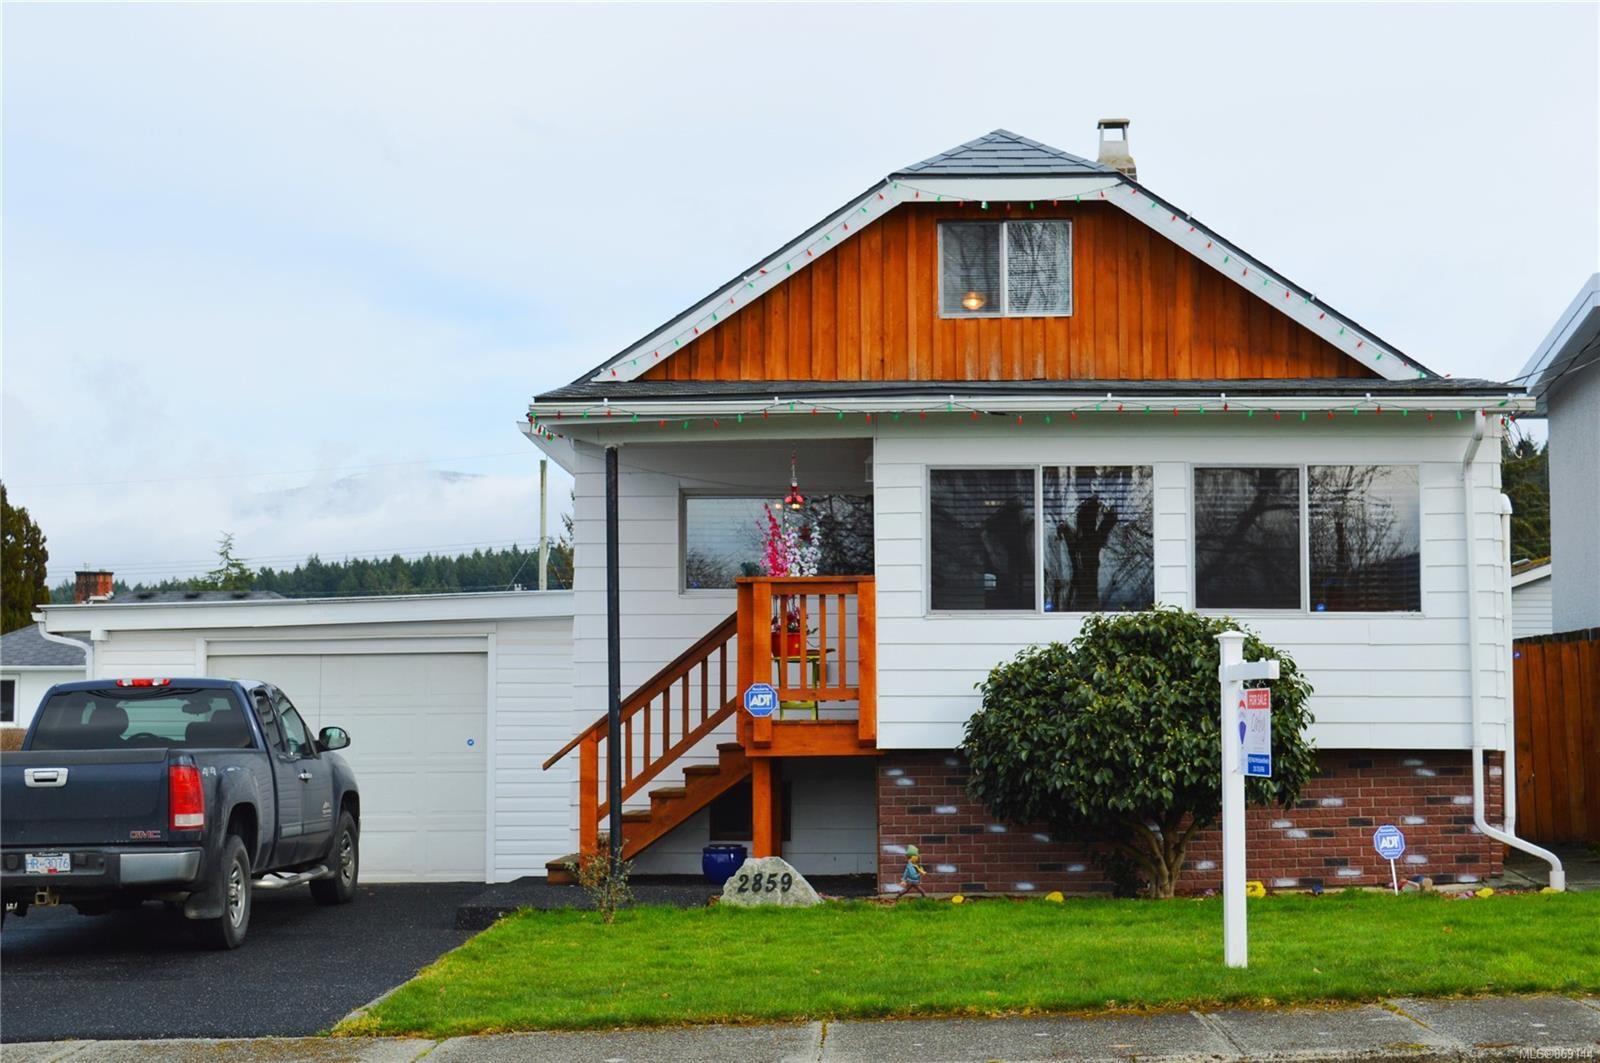 Main Photo: 2859 11th Ave in : PA Port Alberni House for sale (Port Alberni)  : MLS®# 869144